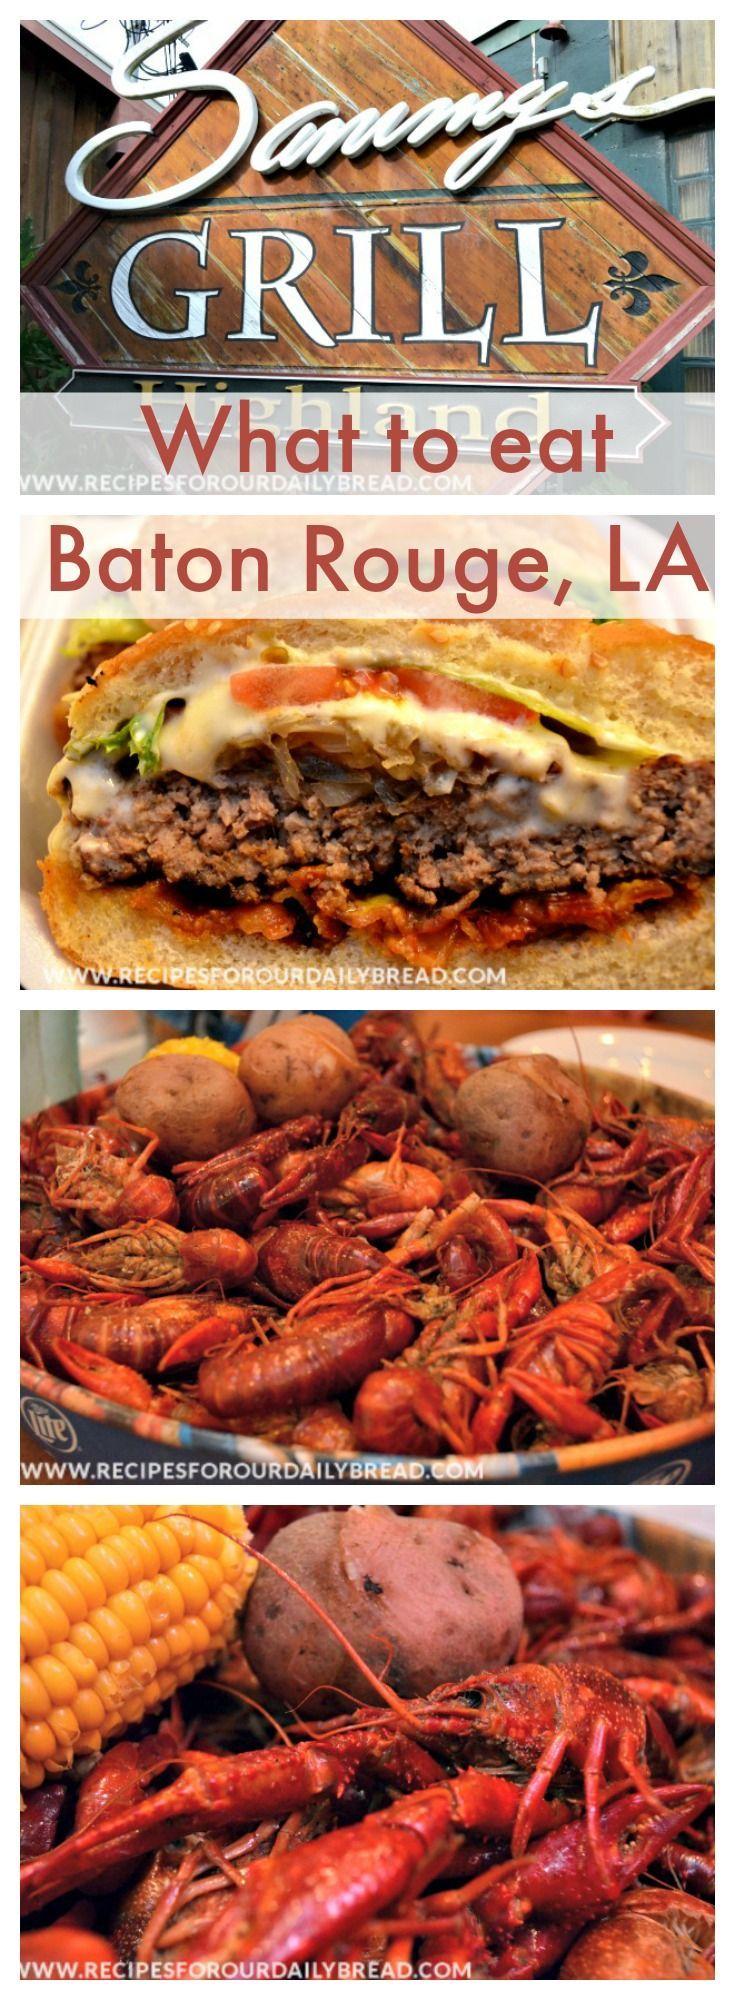 What to eat in Baton Rouge, LA? Sammy's Grill http://recipesforourdailybread.com/2014/06/26/sammys-grill-review-baton-rouge-la/ #restaurant review #baton rouge LA #Cajun food